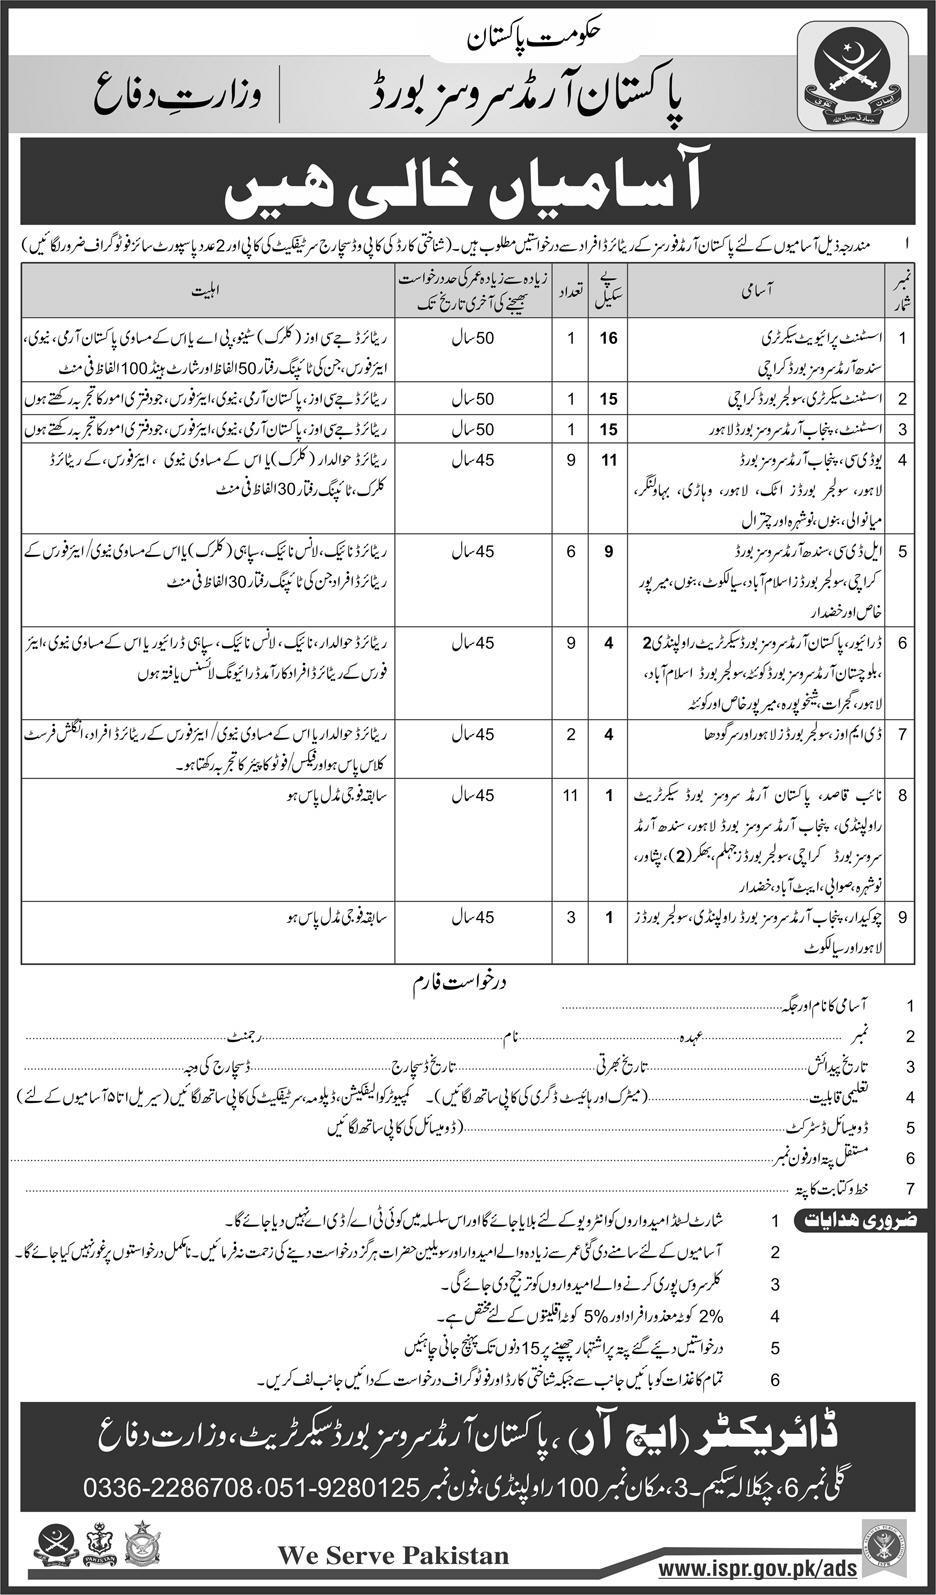 Pakistan Armed Services Board Jobs 2018